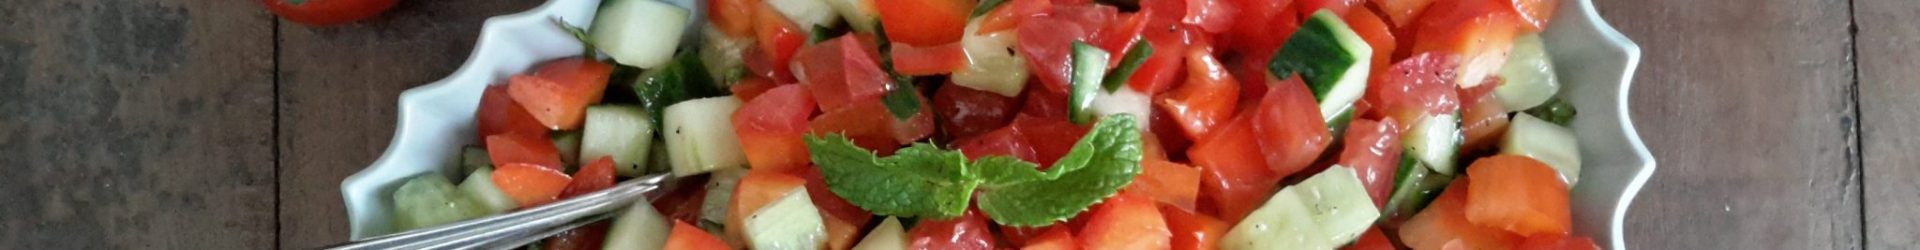 Frisse salade van tomaat, komkommer en paprika